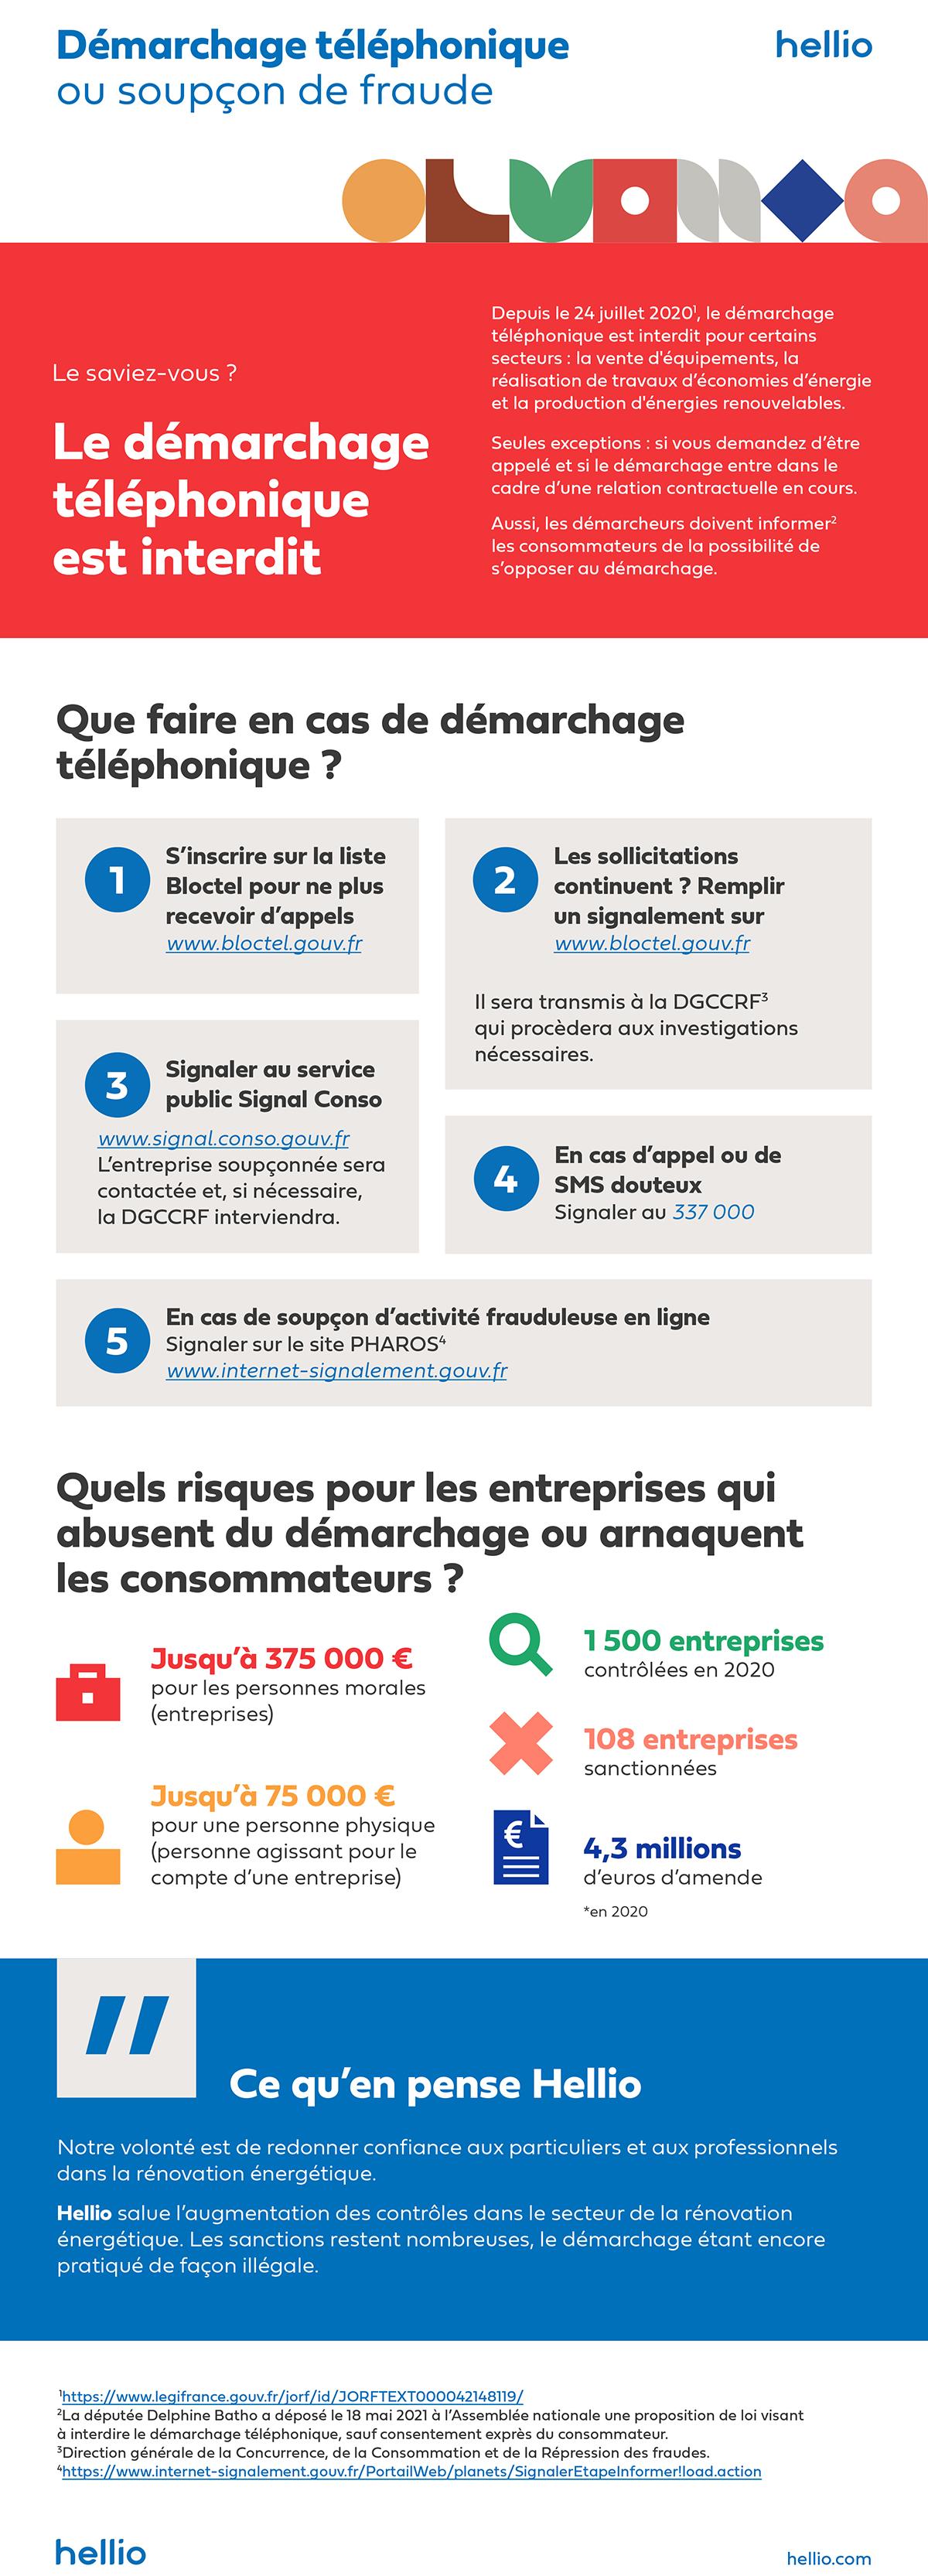 infographie-interdiction-demarchage-telephonique-1-an-apres-v2